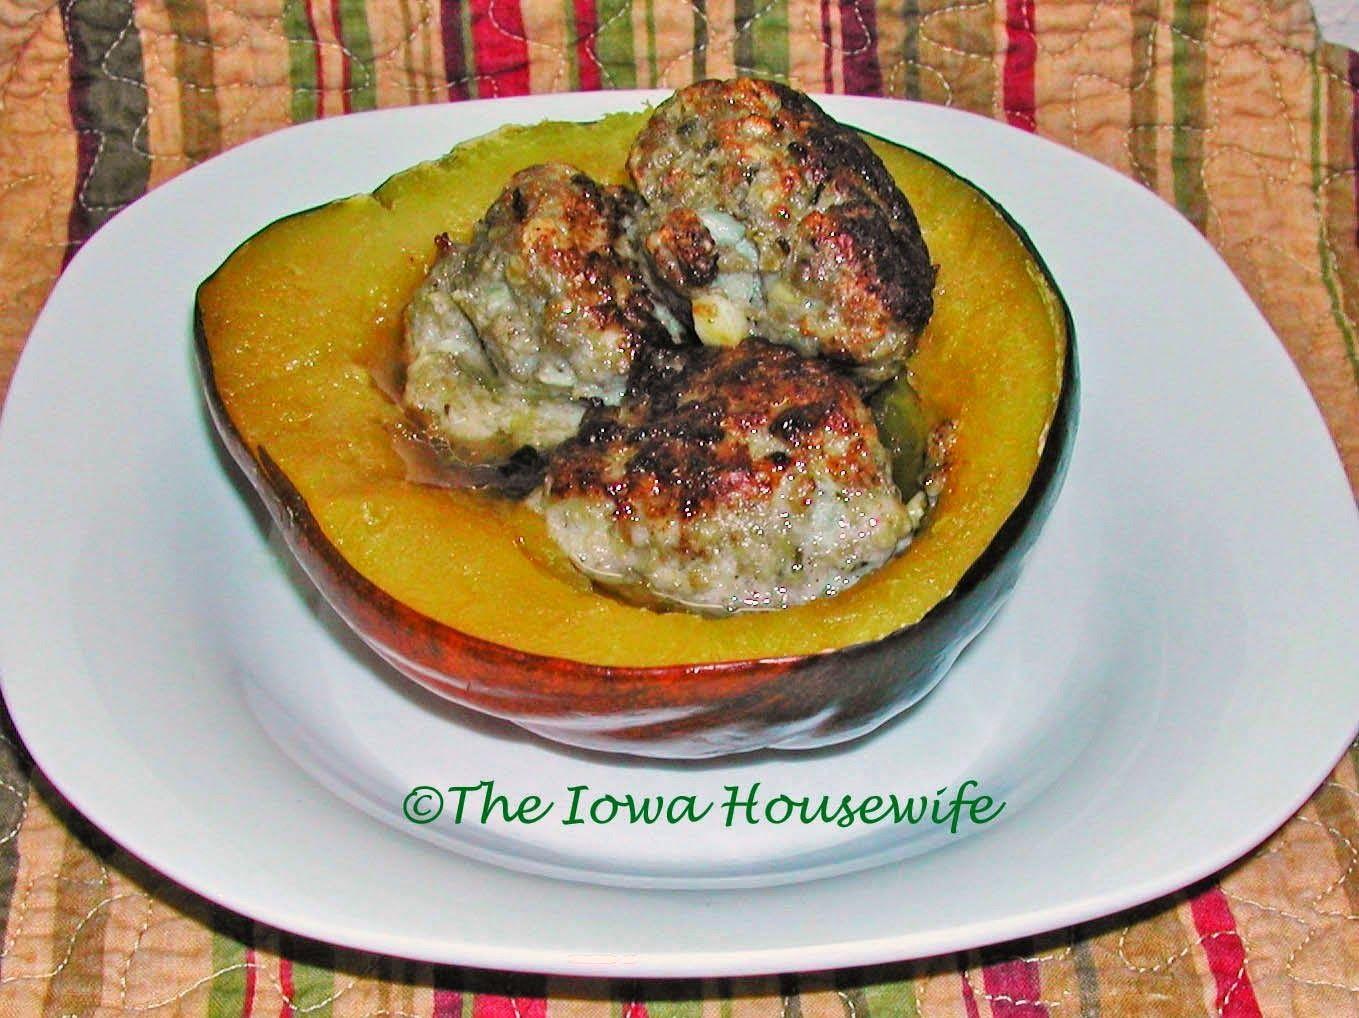 The Iowa Housewife: Sausage-Apple Stuffed Squash